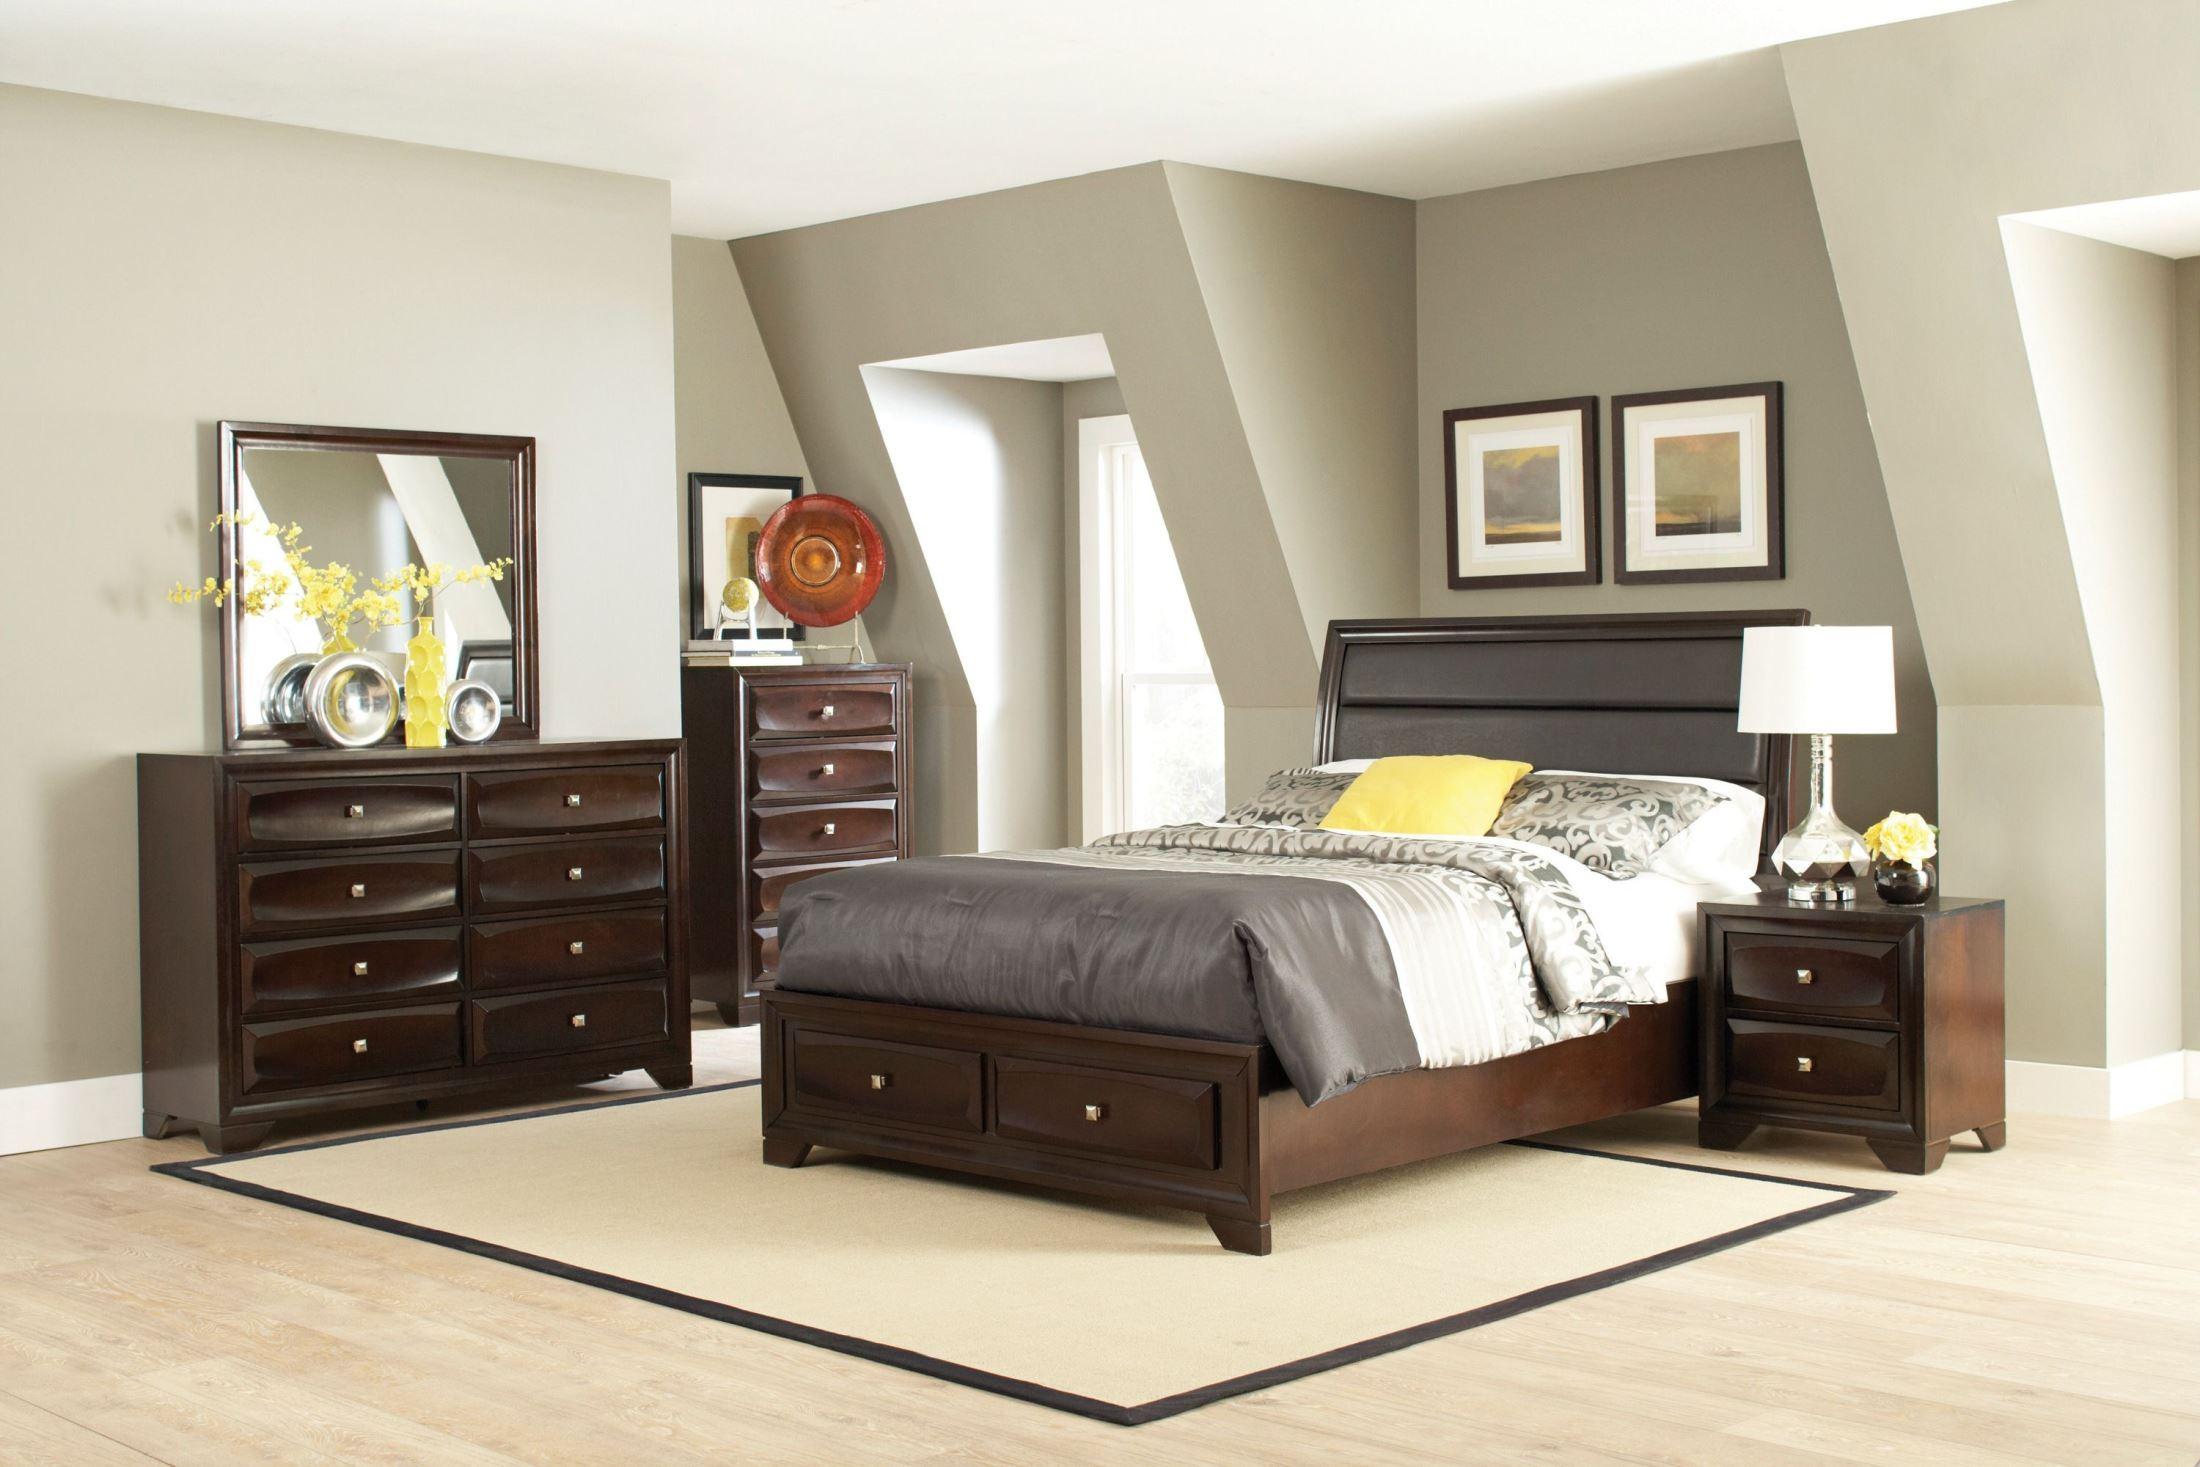 Jaxson storage platform bedroom set from coaster 203481q - Platform bedroom sets with storage ...